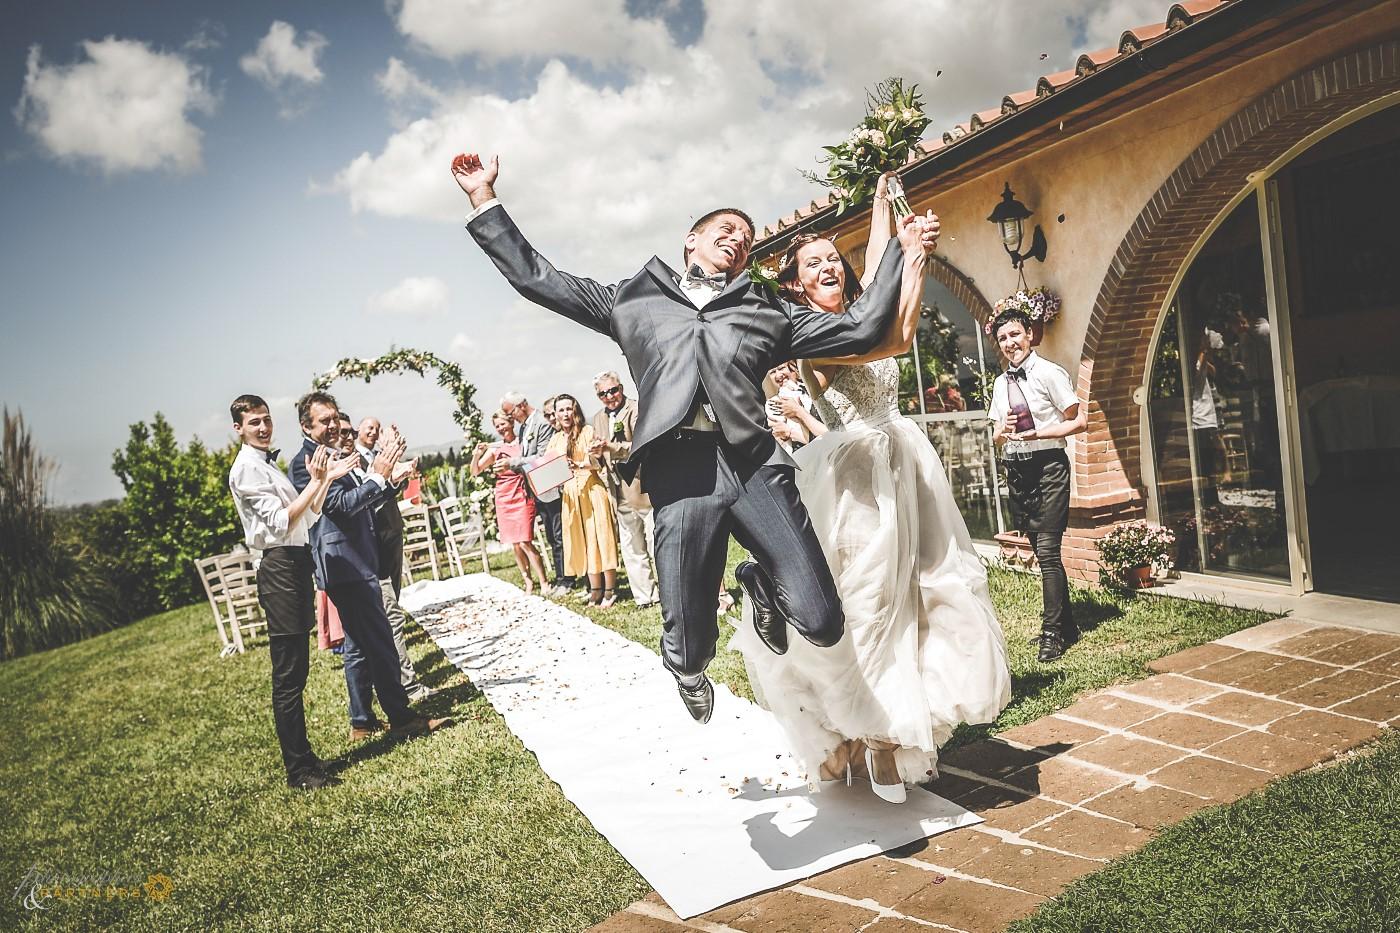 photographer_weddings_grosseto_07.jpg